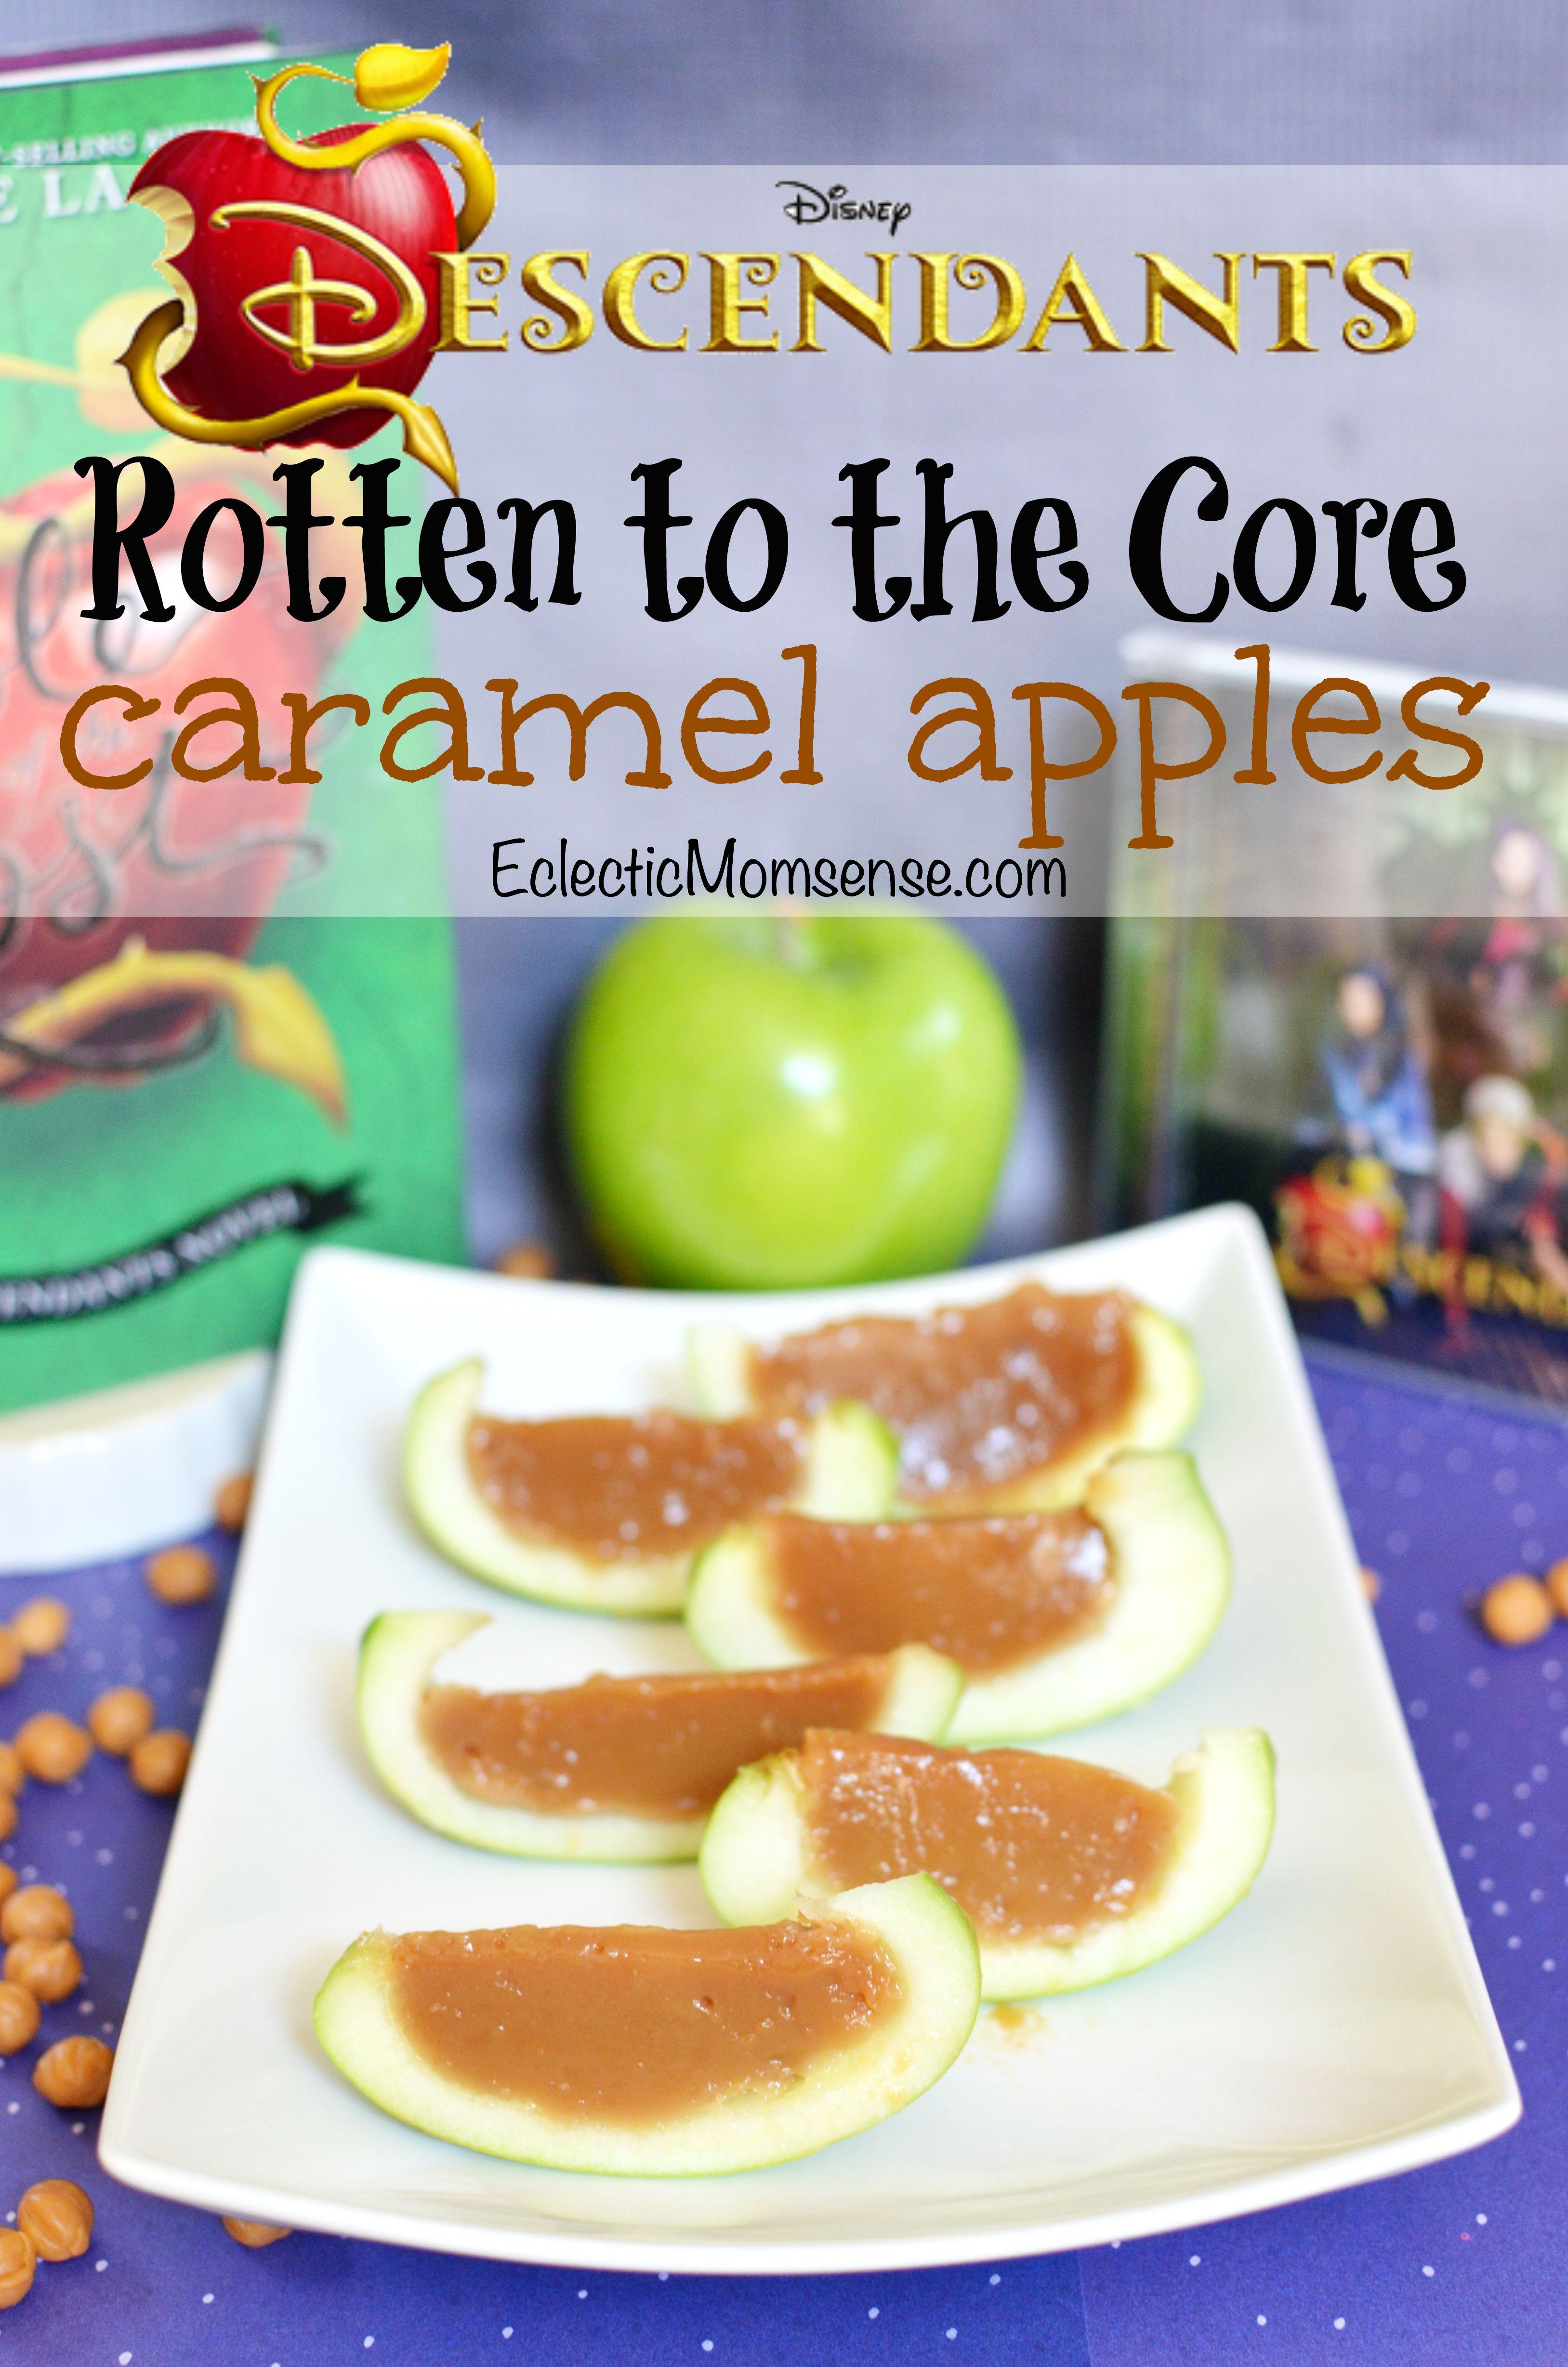 Disney Descendants Rotten To The Core Jello Caramel Apples